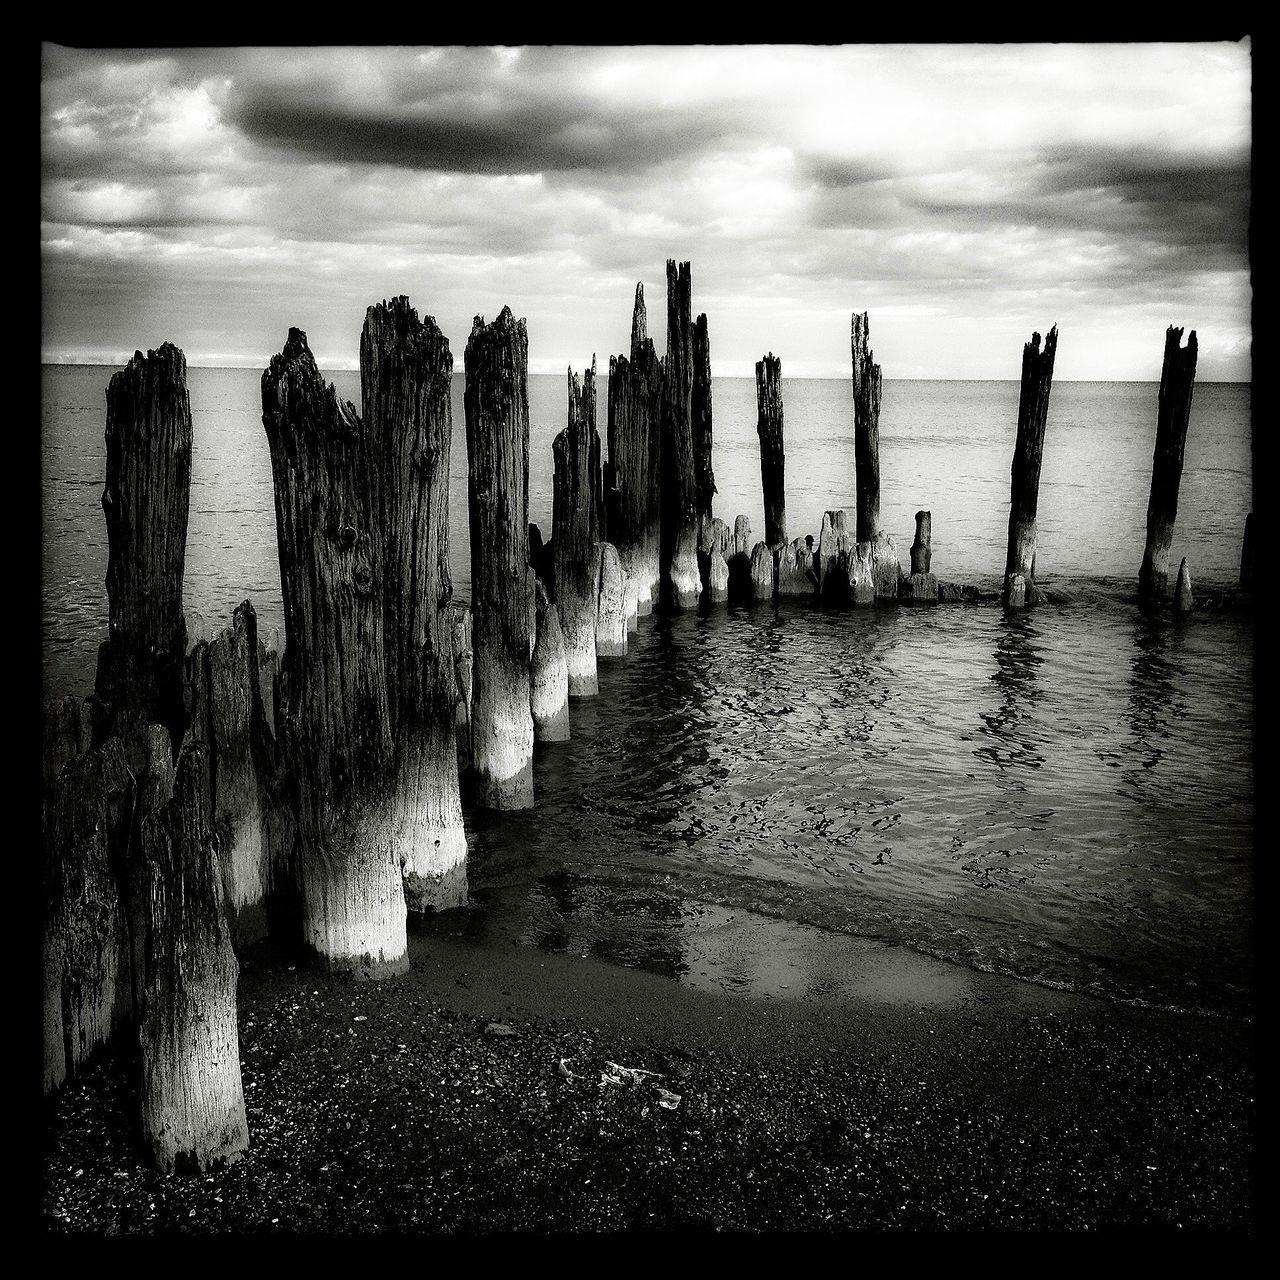 EyeEm Best Shots - Everything Wet Water_collection NEM Black&white Shootermag